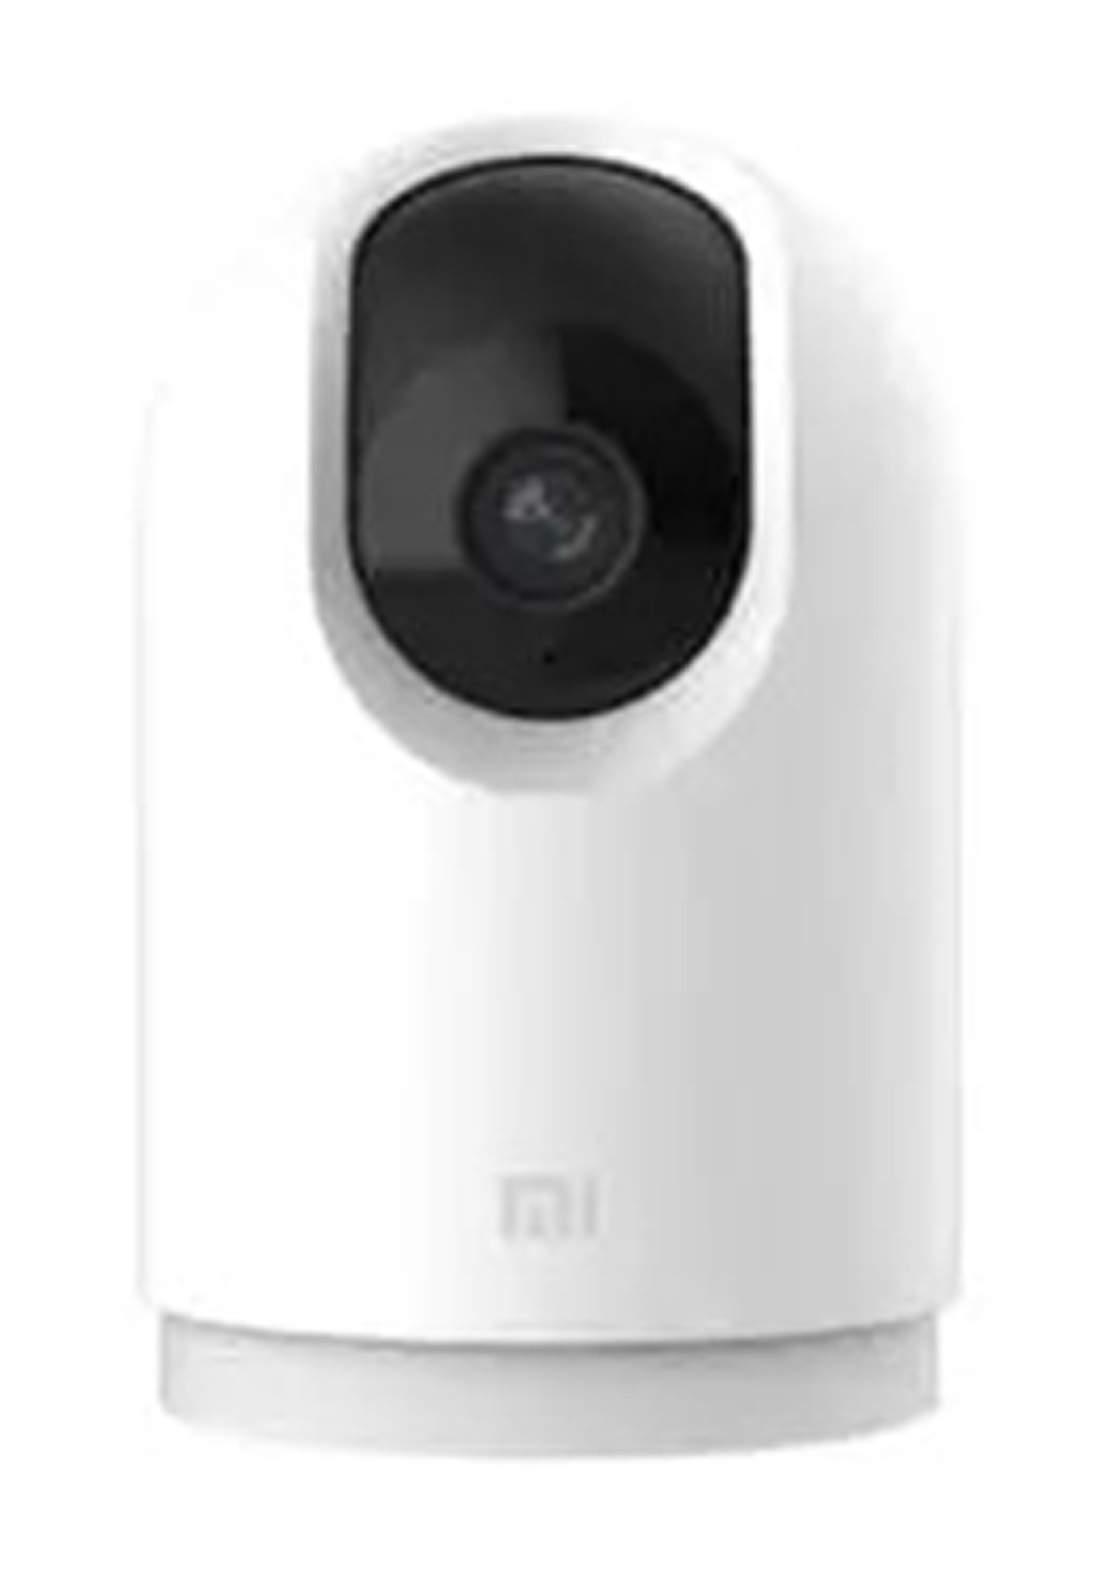 Xiaomi (BHR4193GL) Mi 360 Home Security Camera 2k Pro - White  كاميرا منزل